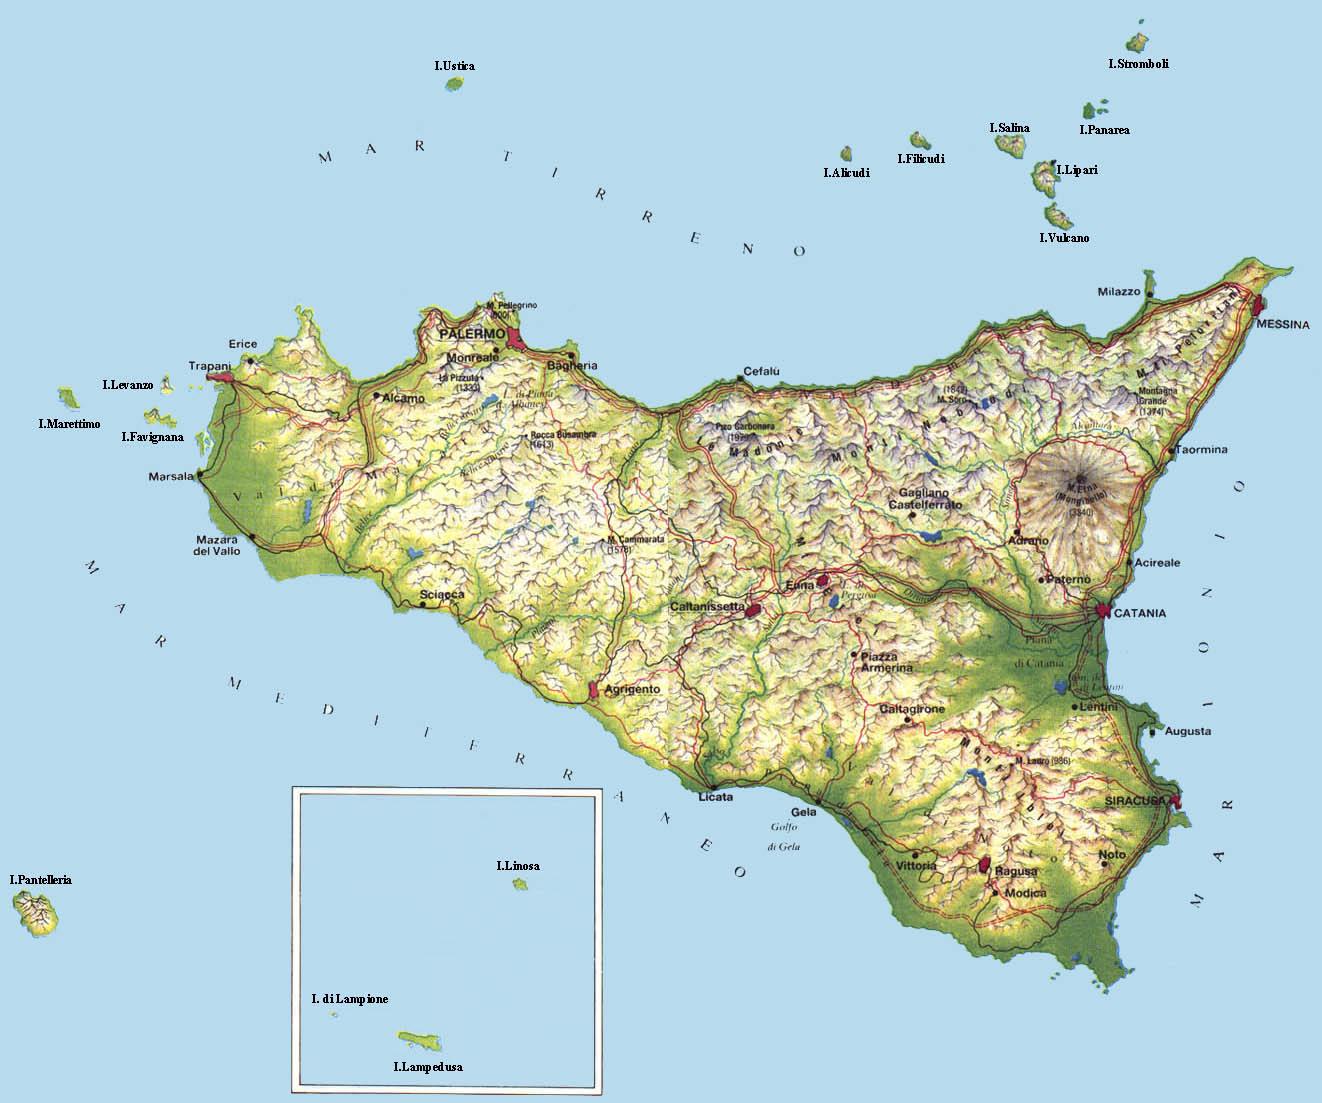 Geologia delletna etnatao etna excursions carta geografica sicilia altavistaventures Images